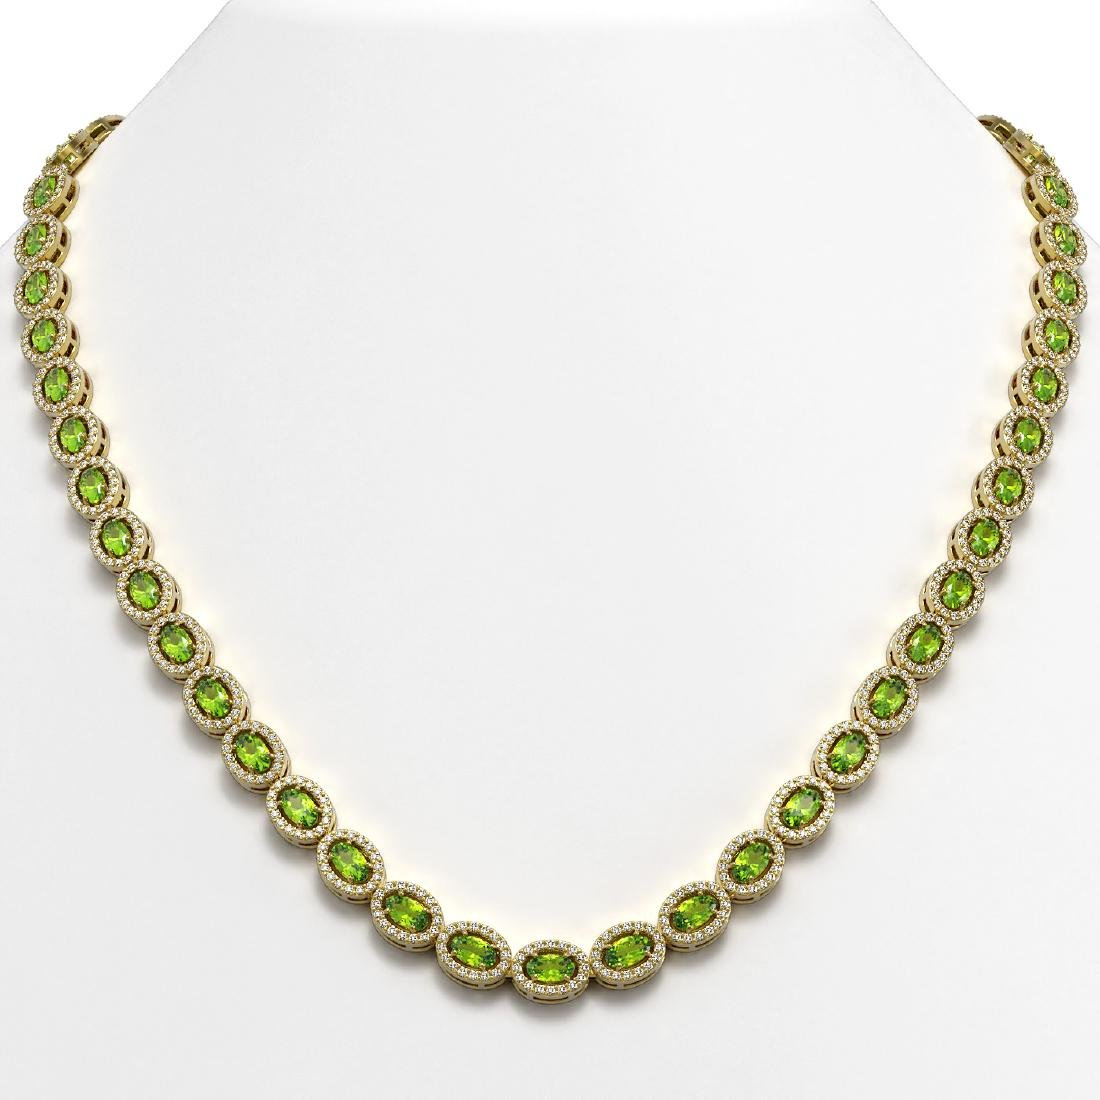 23.86 CTW Peridot & Diamond Halo Necklace 10K Yellow